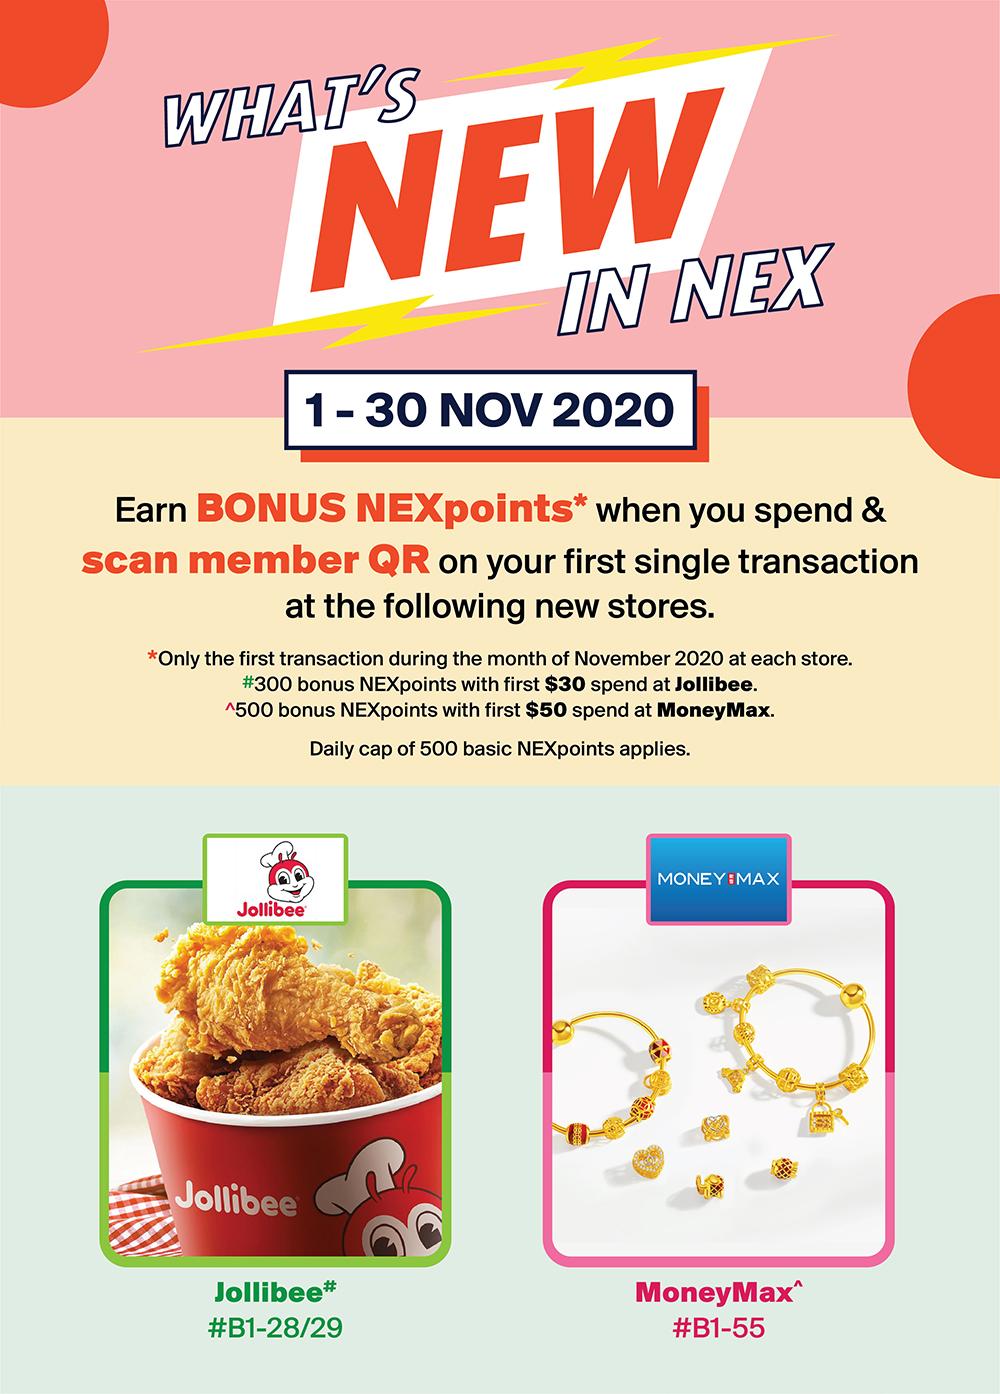 5086NEX_Spotlight on NEW Tenants eDM (Nov)_FINAL